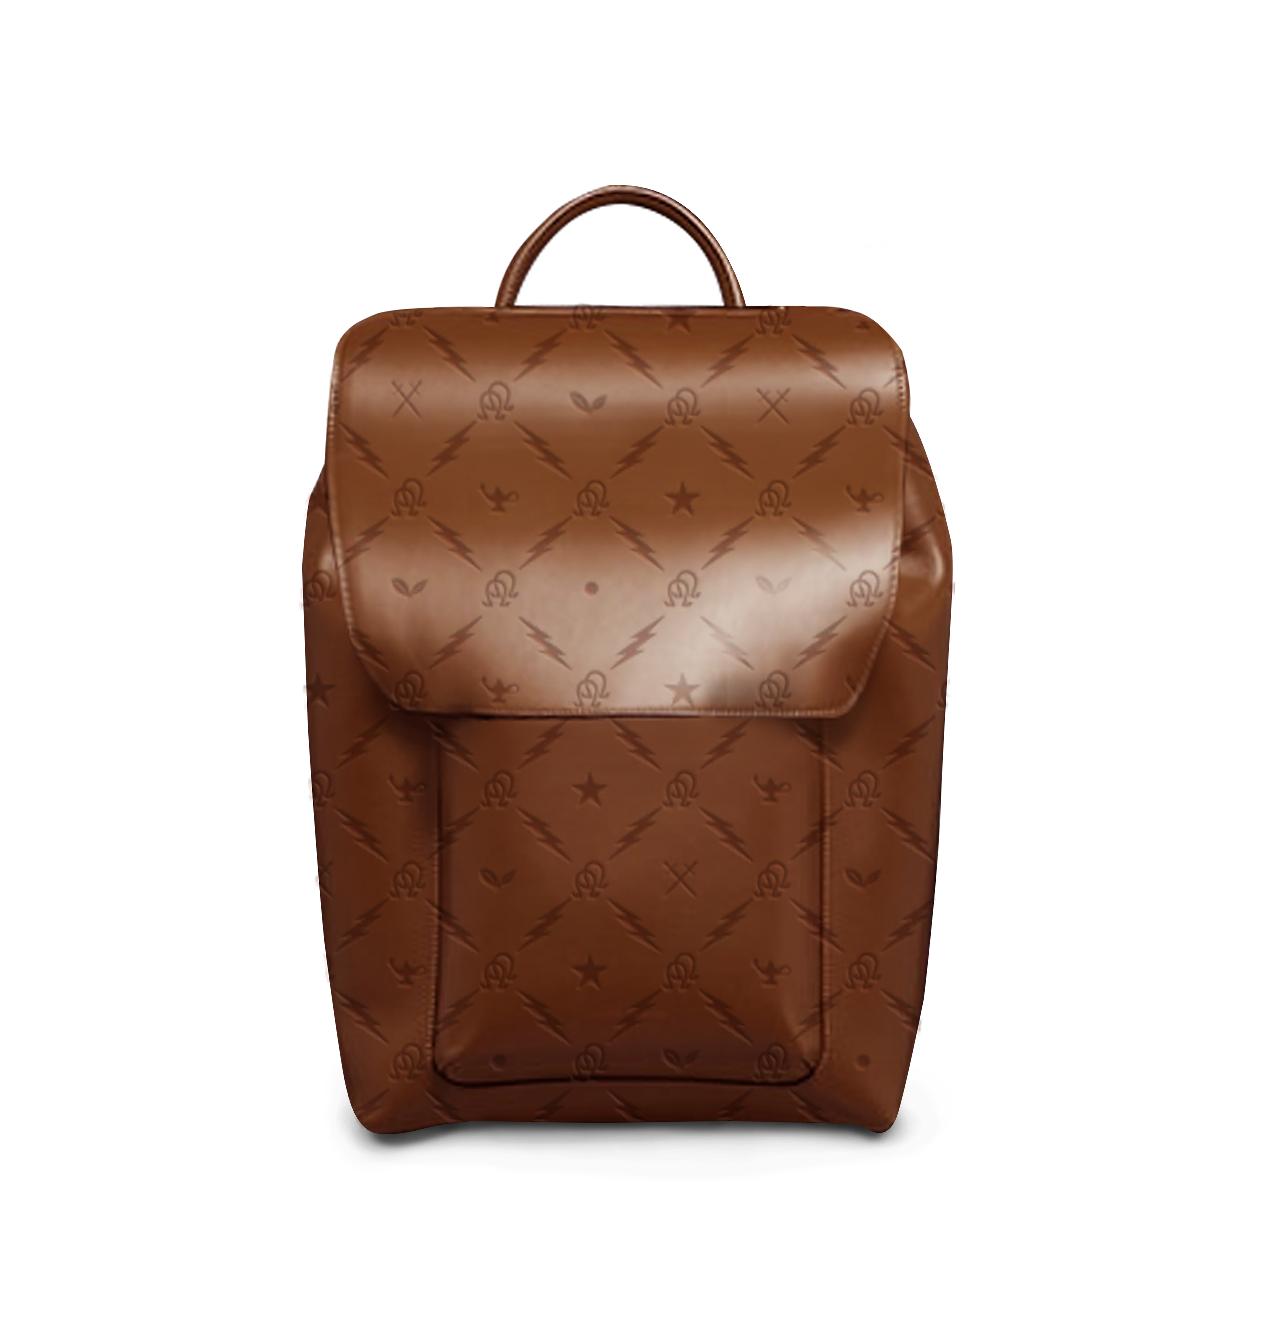 Omega-Motif-Embossed-Brown-Leather-Bookbag-Close-Up.png